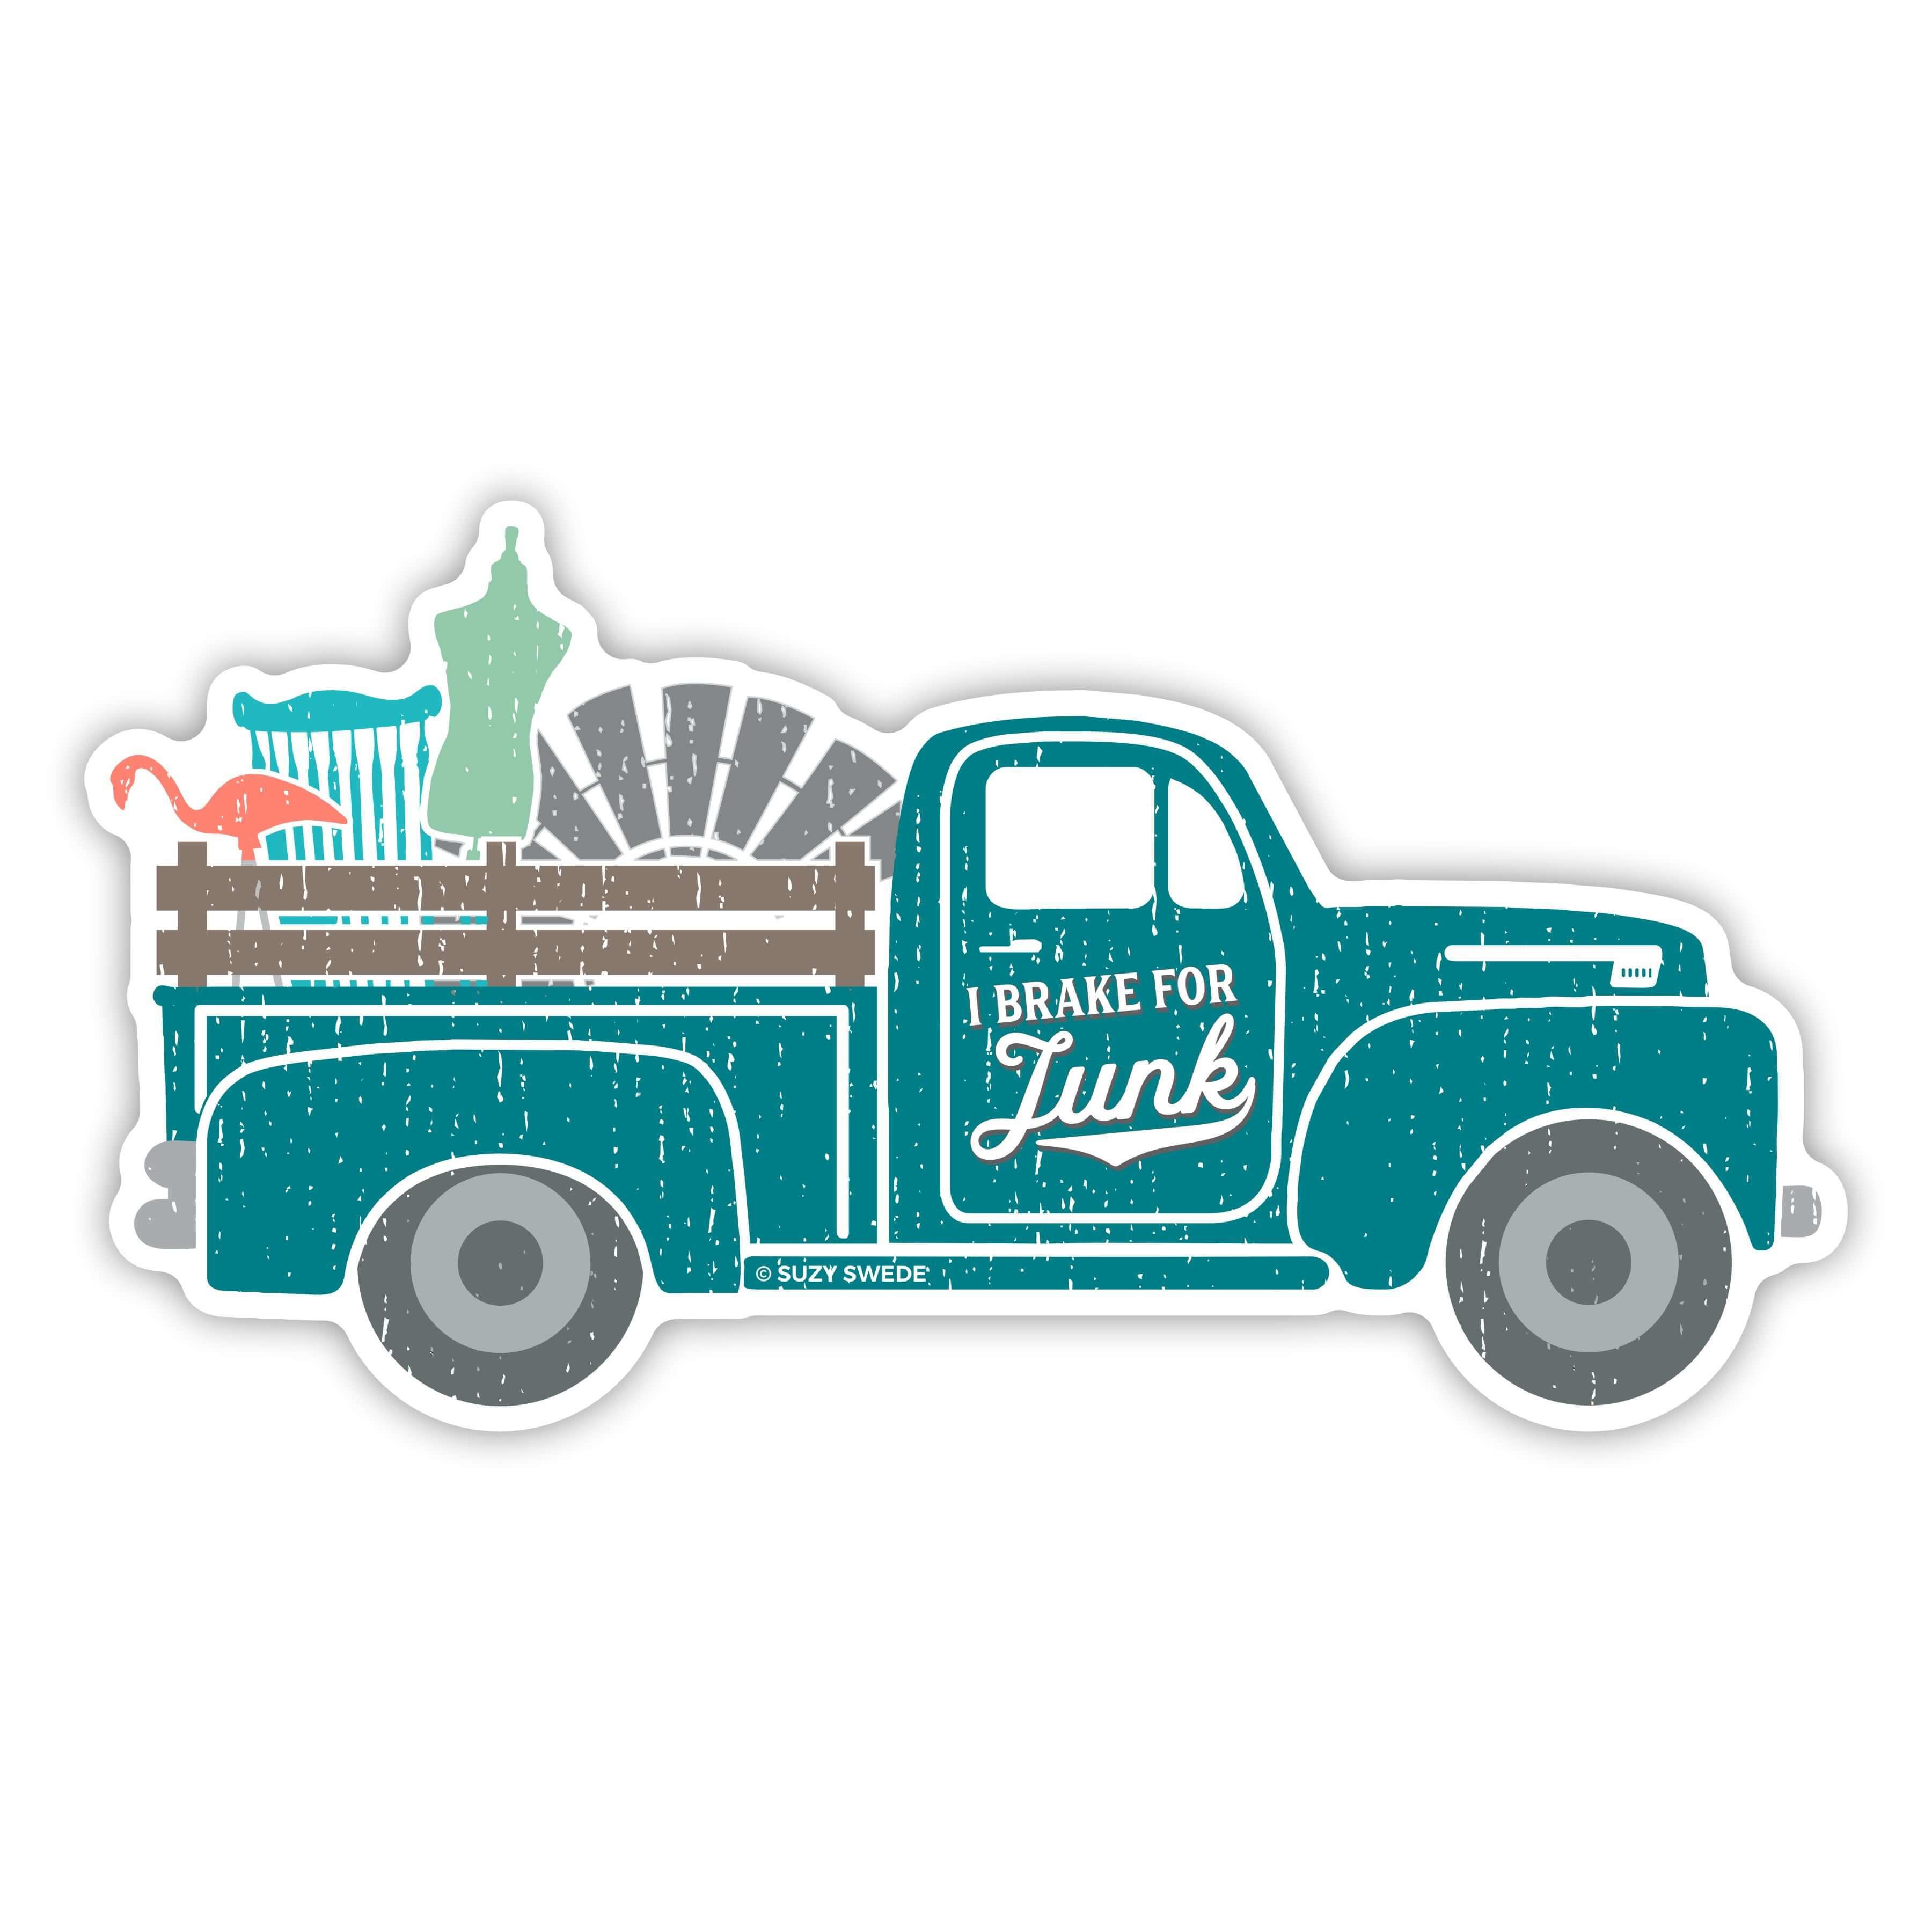 Brake-For-Junk-Sticker